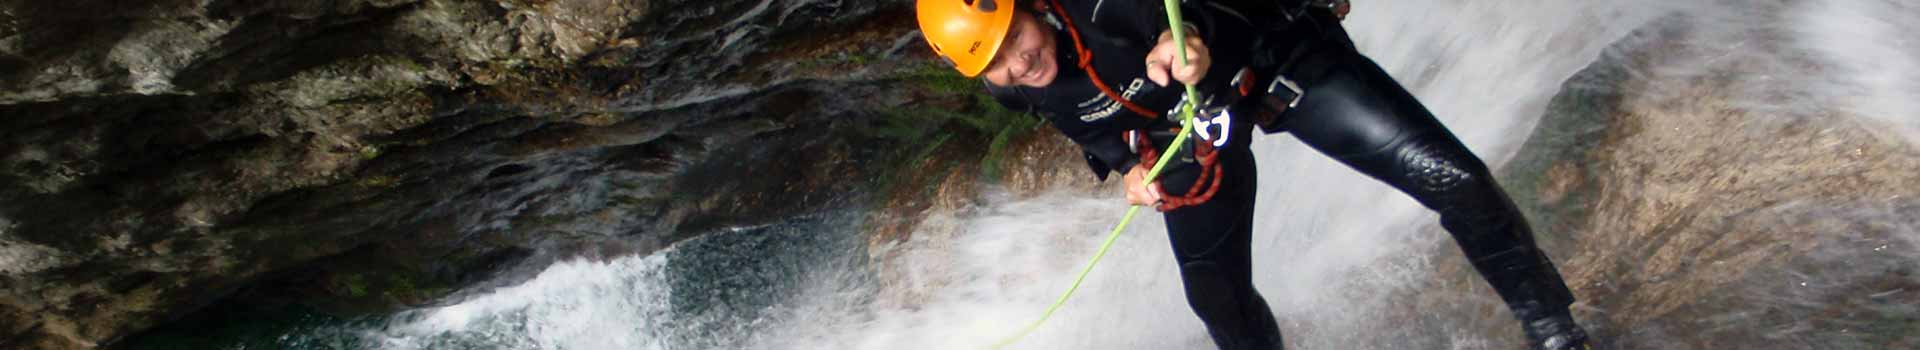 canyoning Trentino